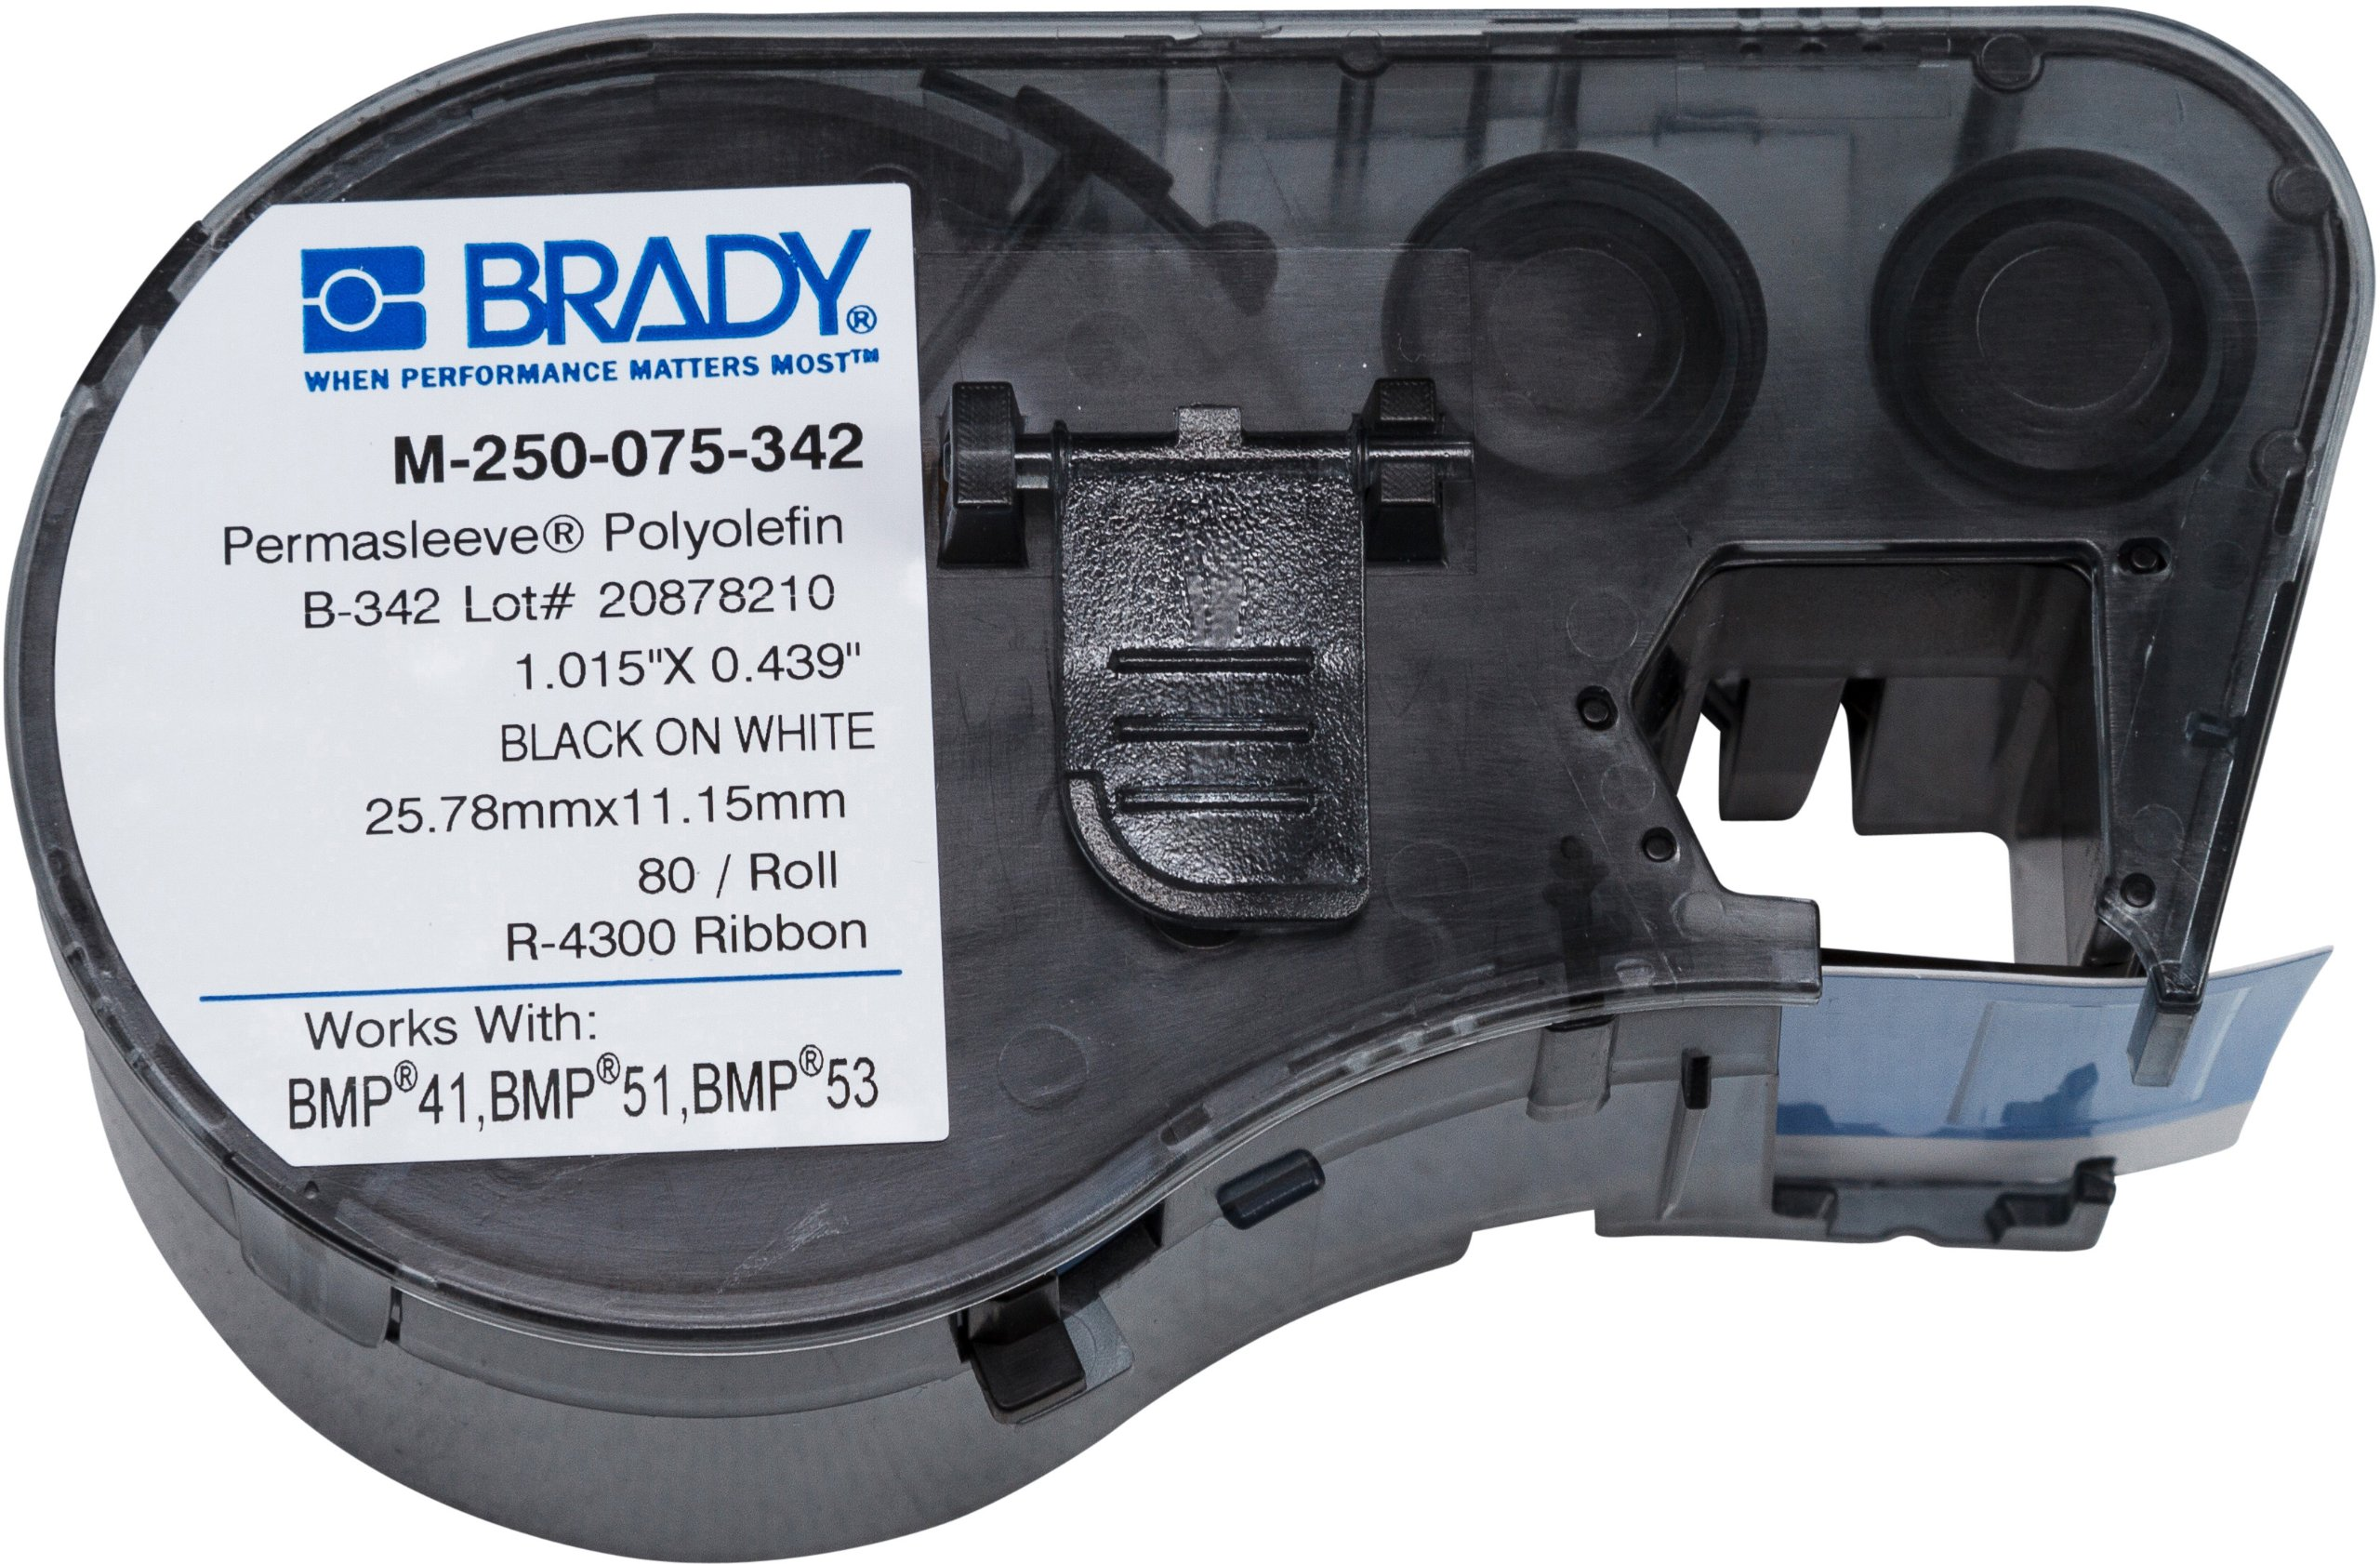 Brady M-250-075-342 Labels for BMP53/BMP51 Printers